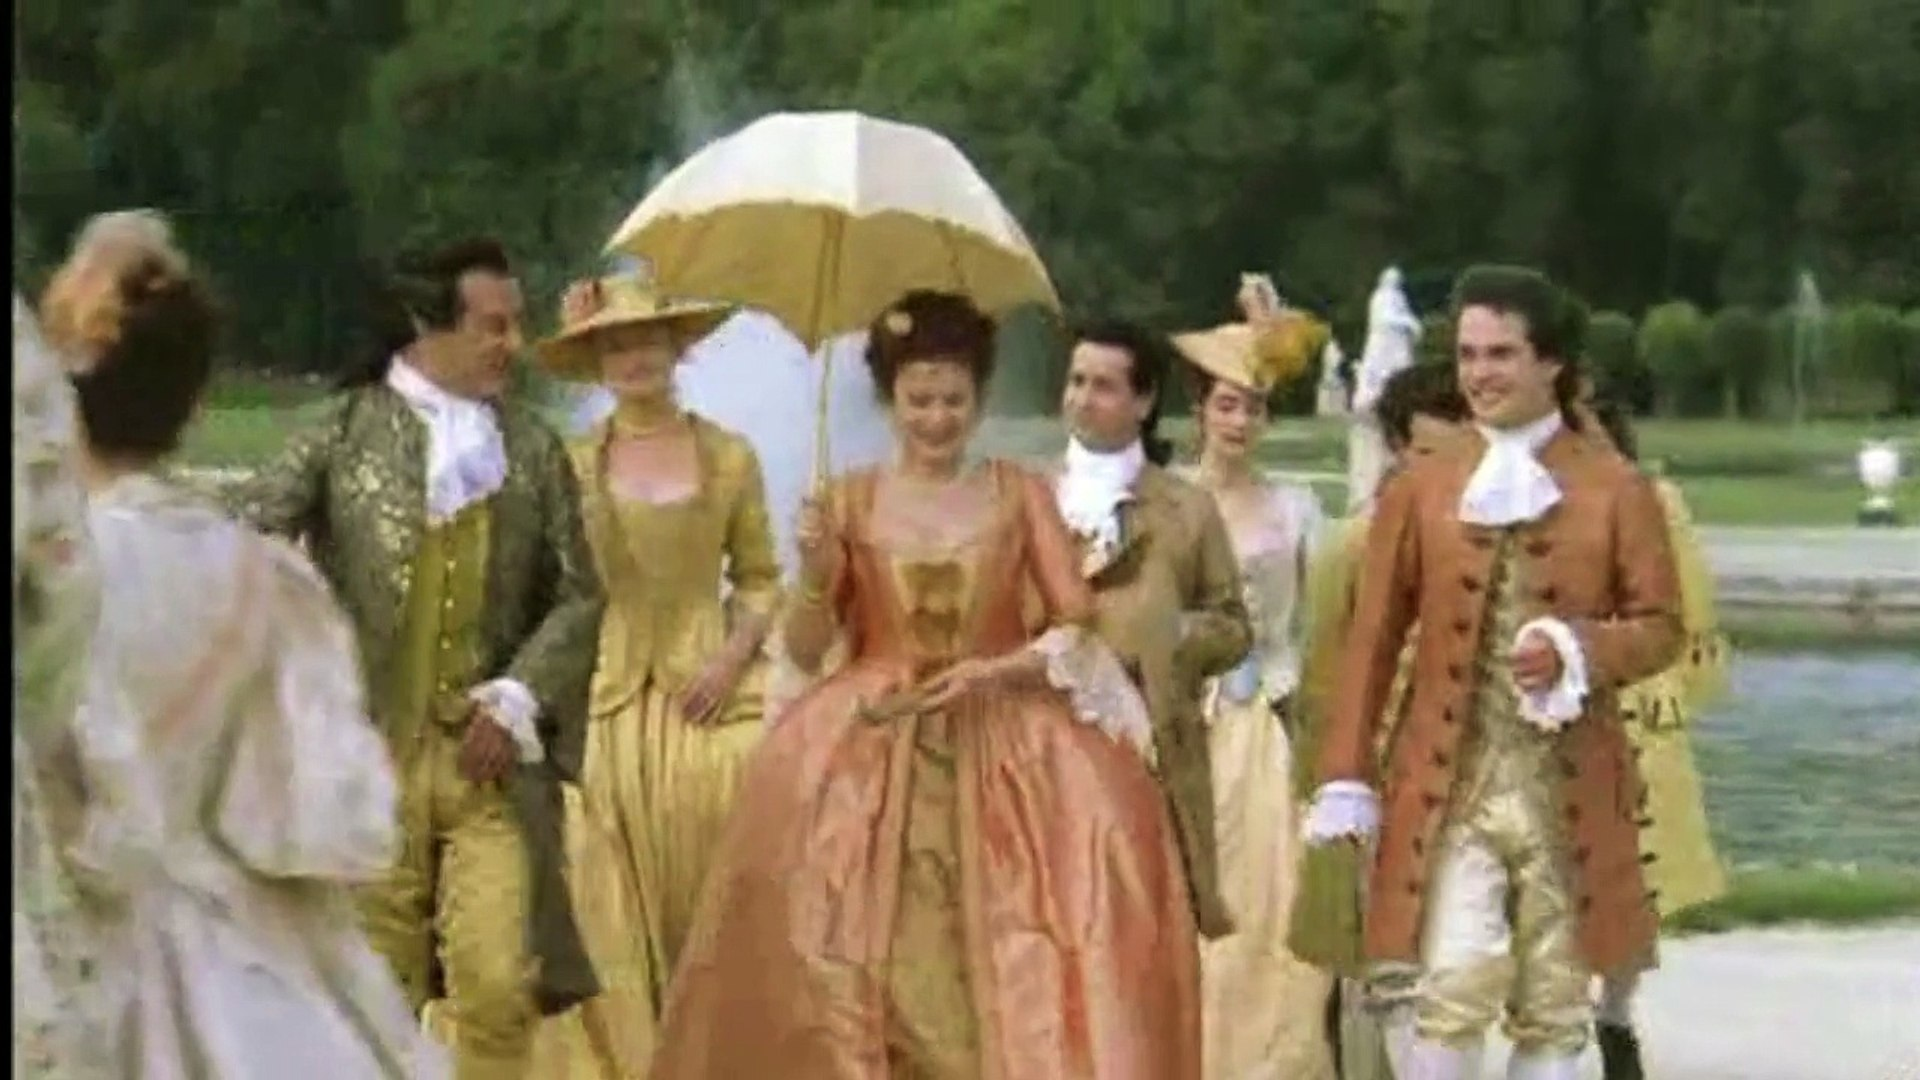 Il giovane Casanova (film tv)- puntata 2 (II parte) - Video Dailymotion